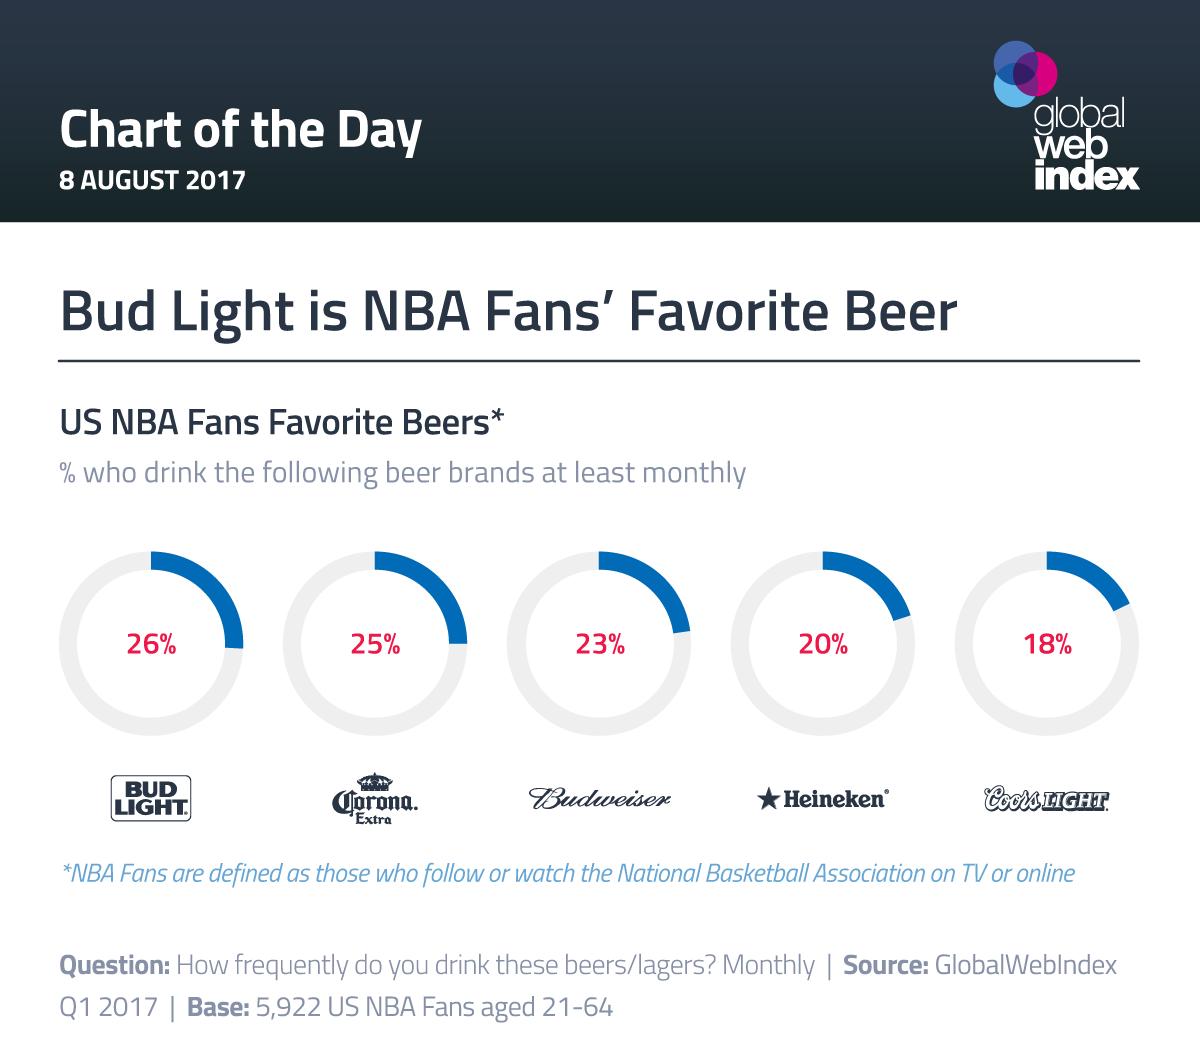 Bud Light is NBA Fans' Favorite Beer